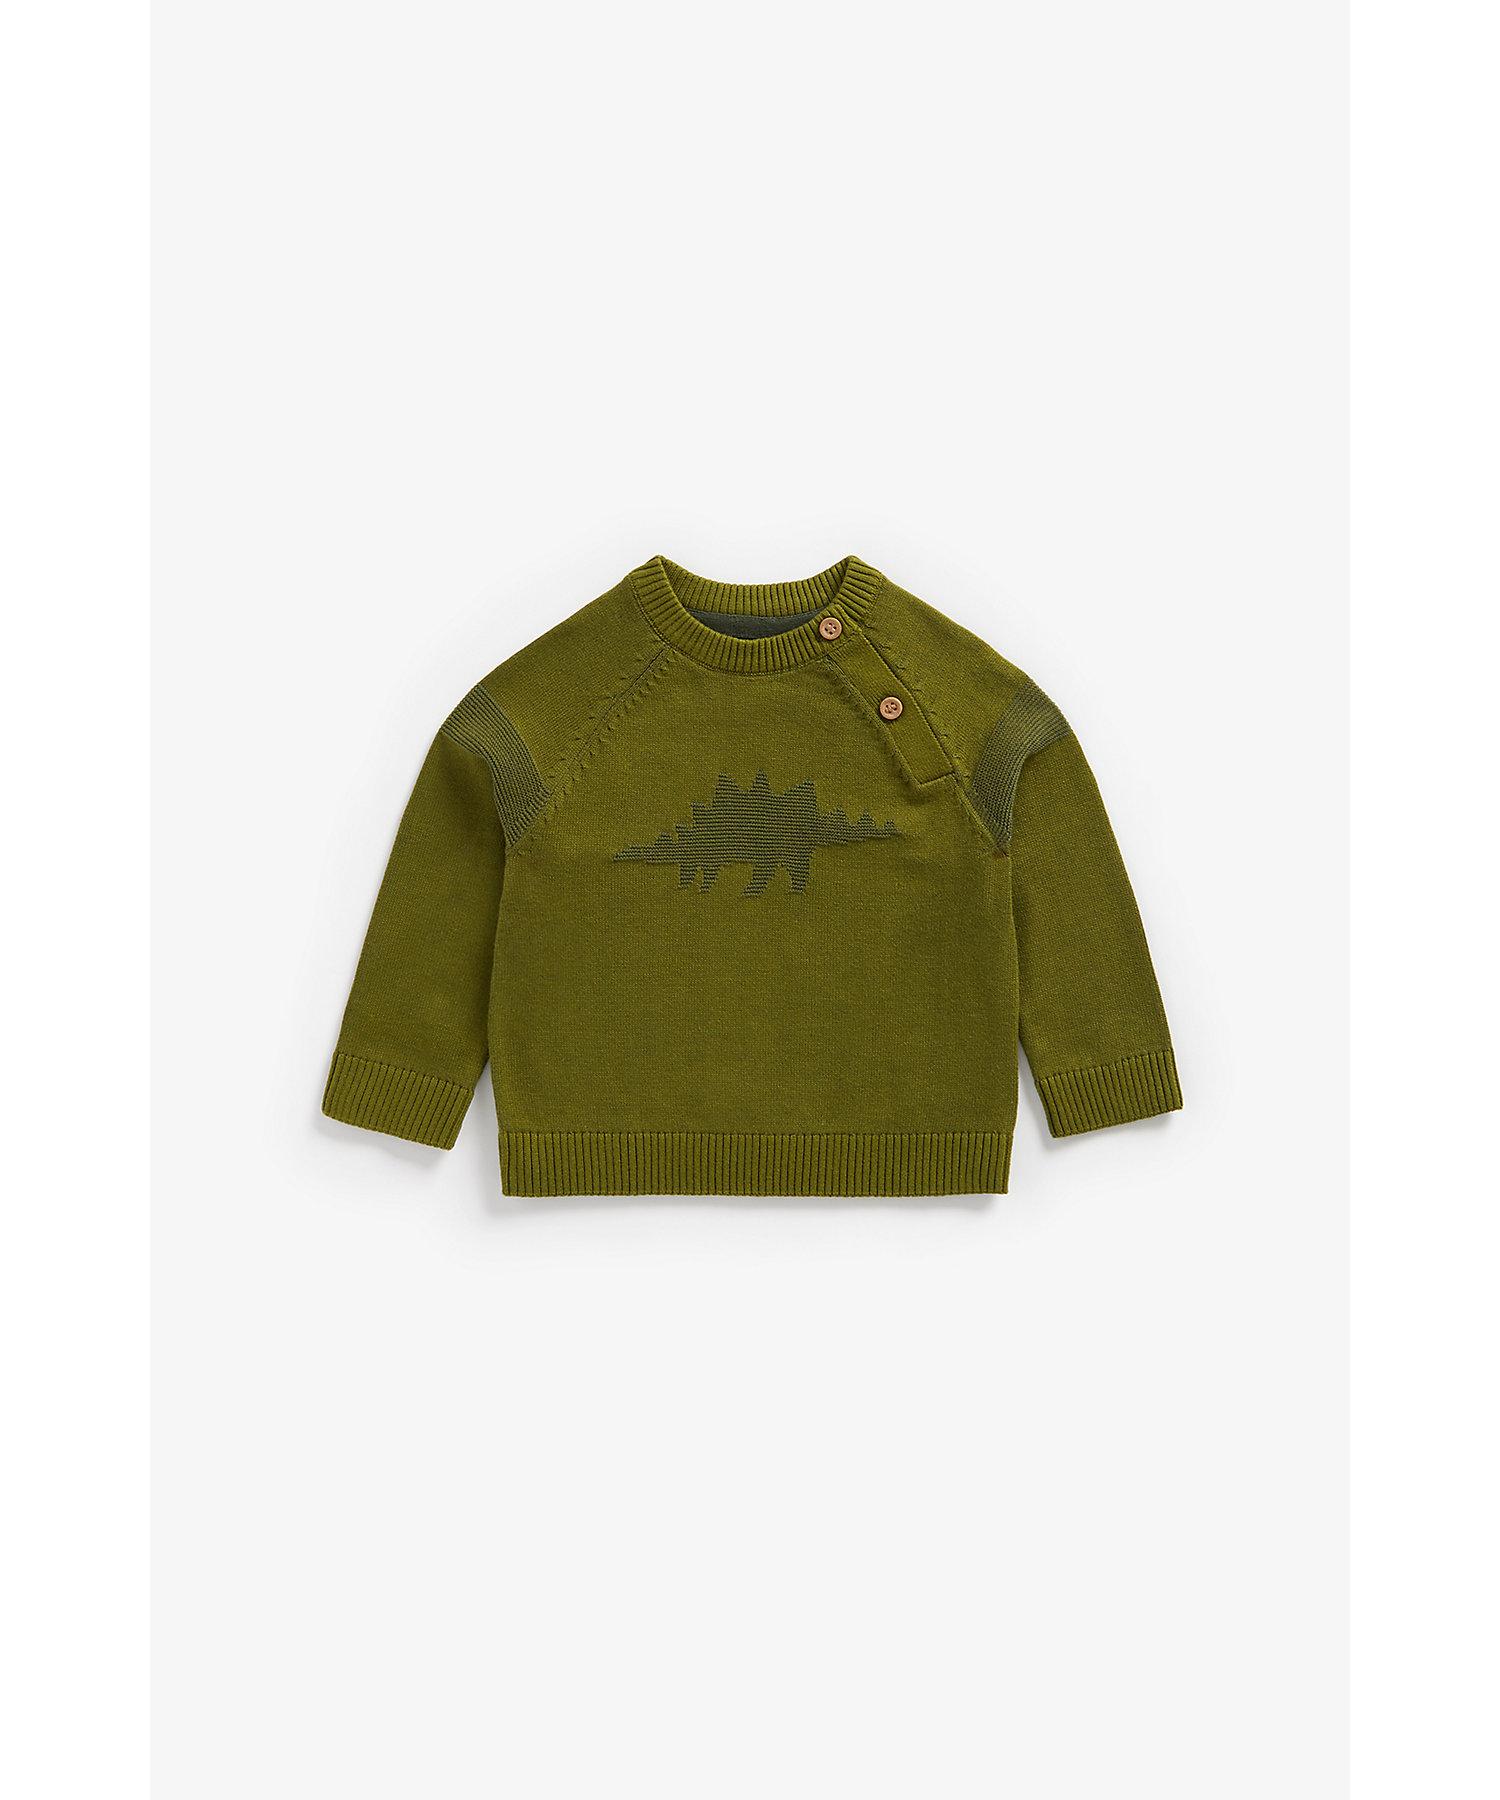 Mothercare   Boys Full Sleeves Sweater Dino Pattern - Khaki